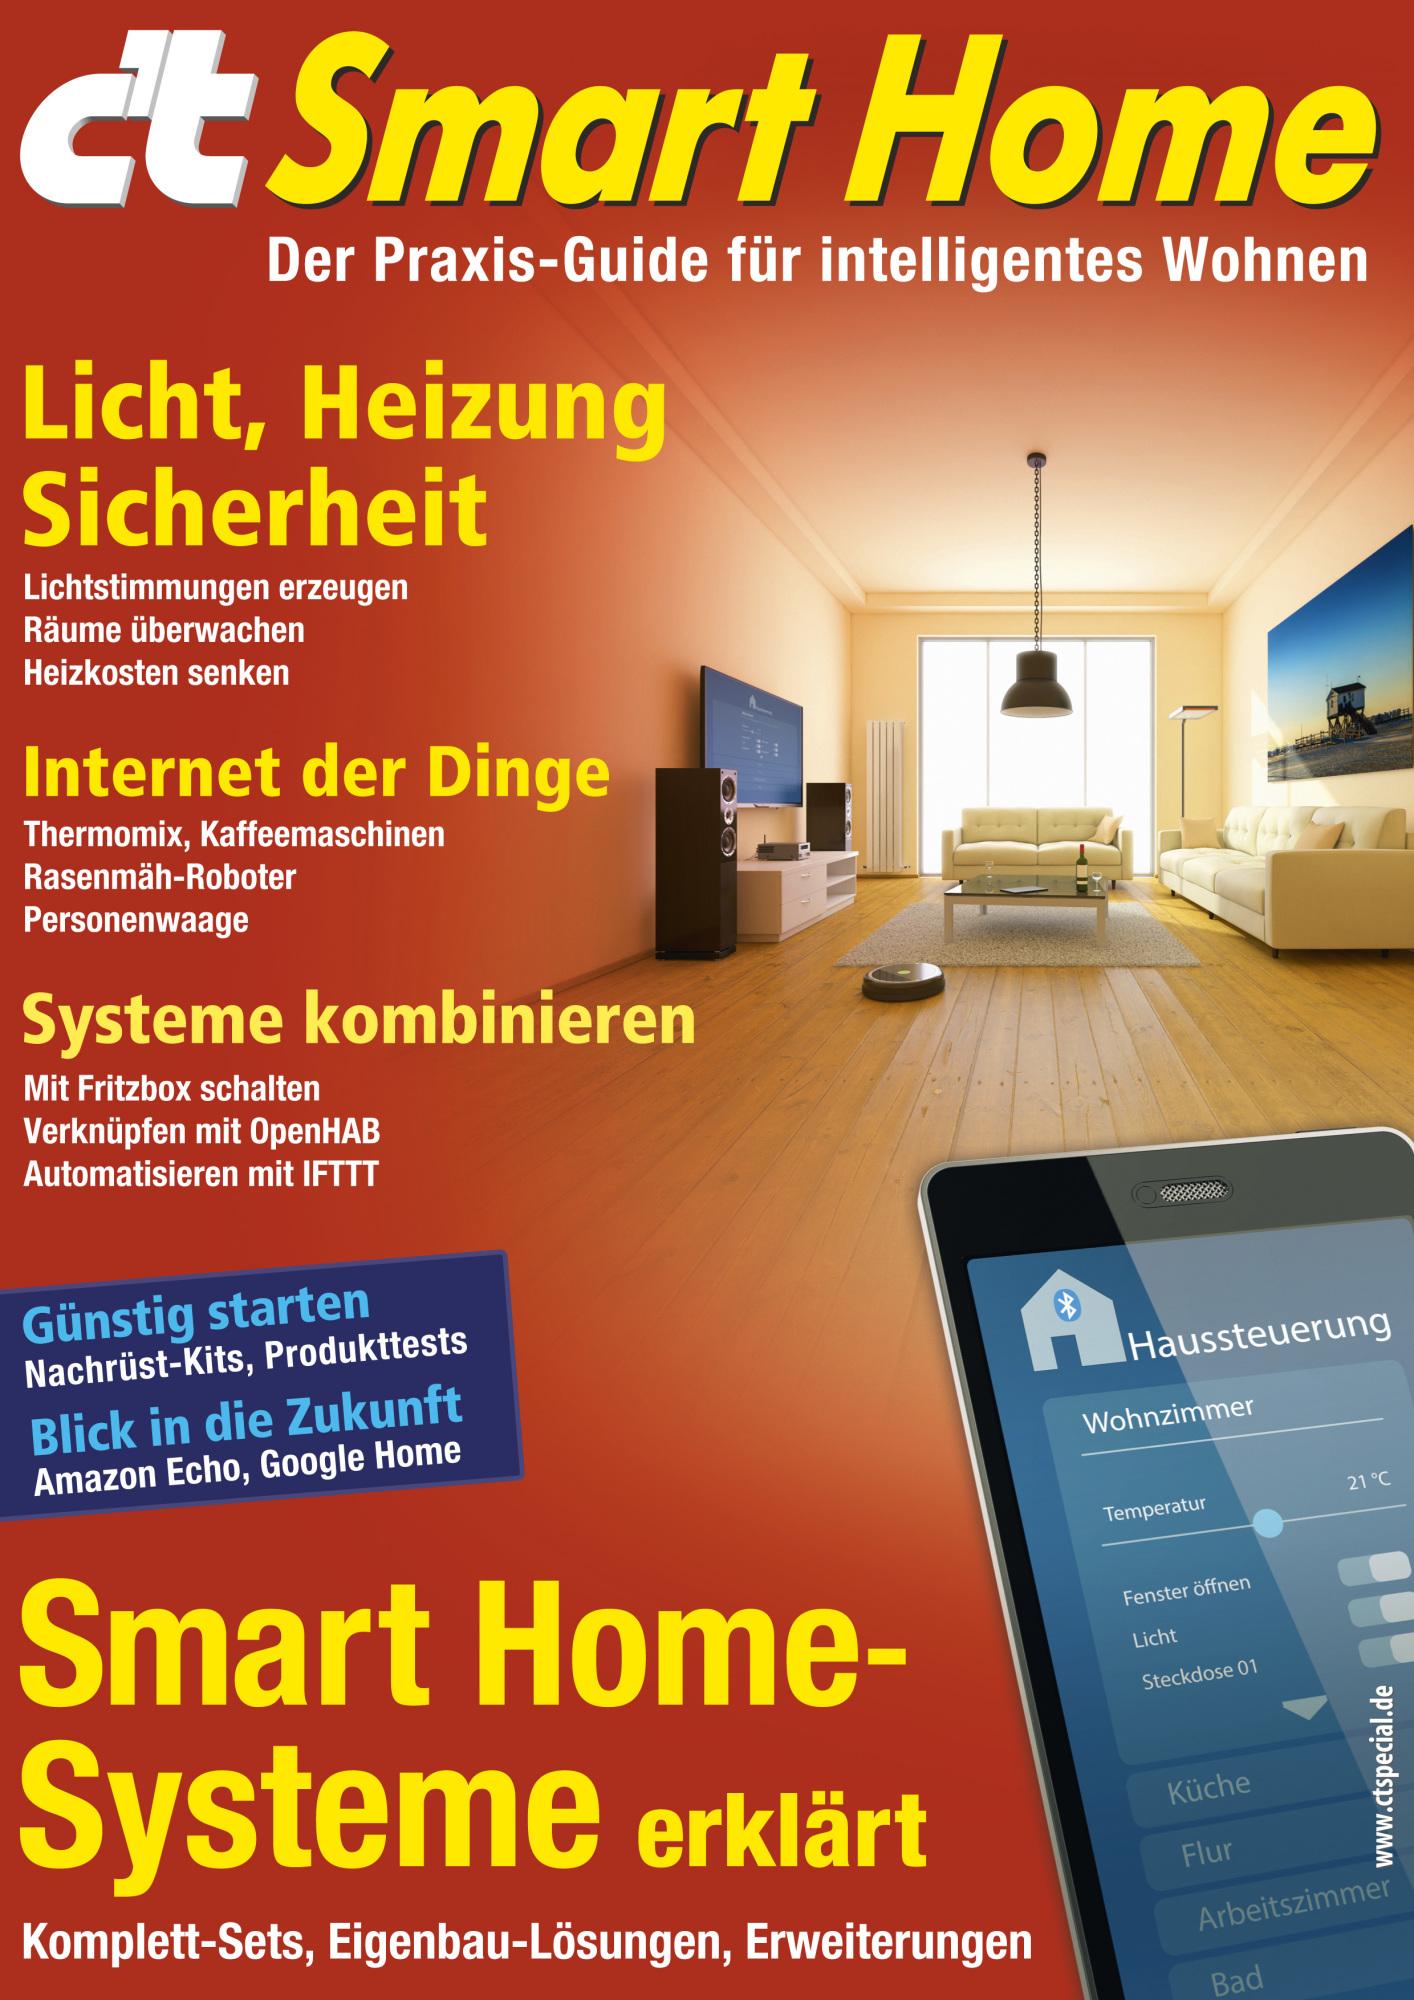 ct-smarthome-Computer-essen